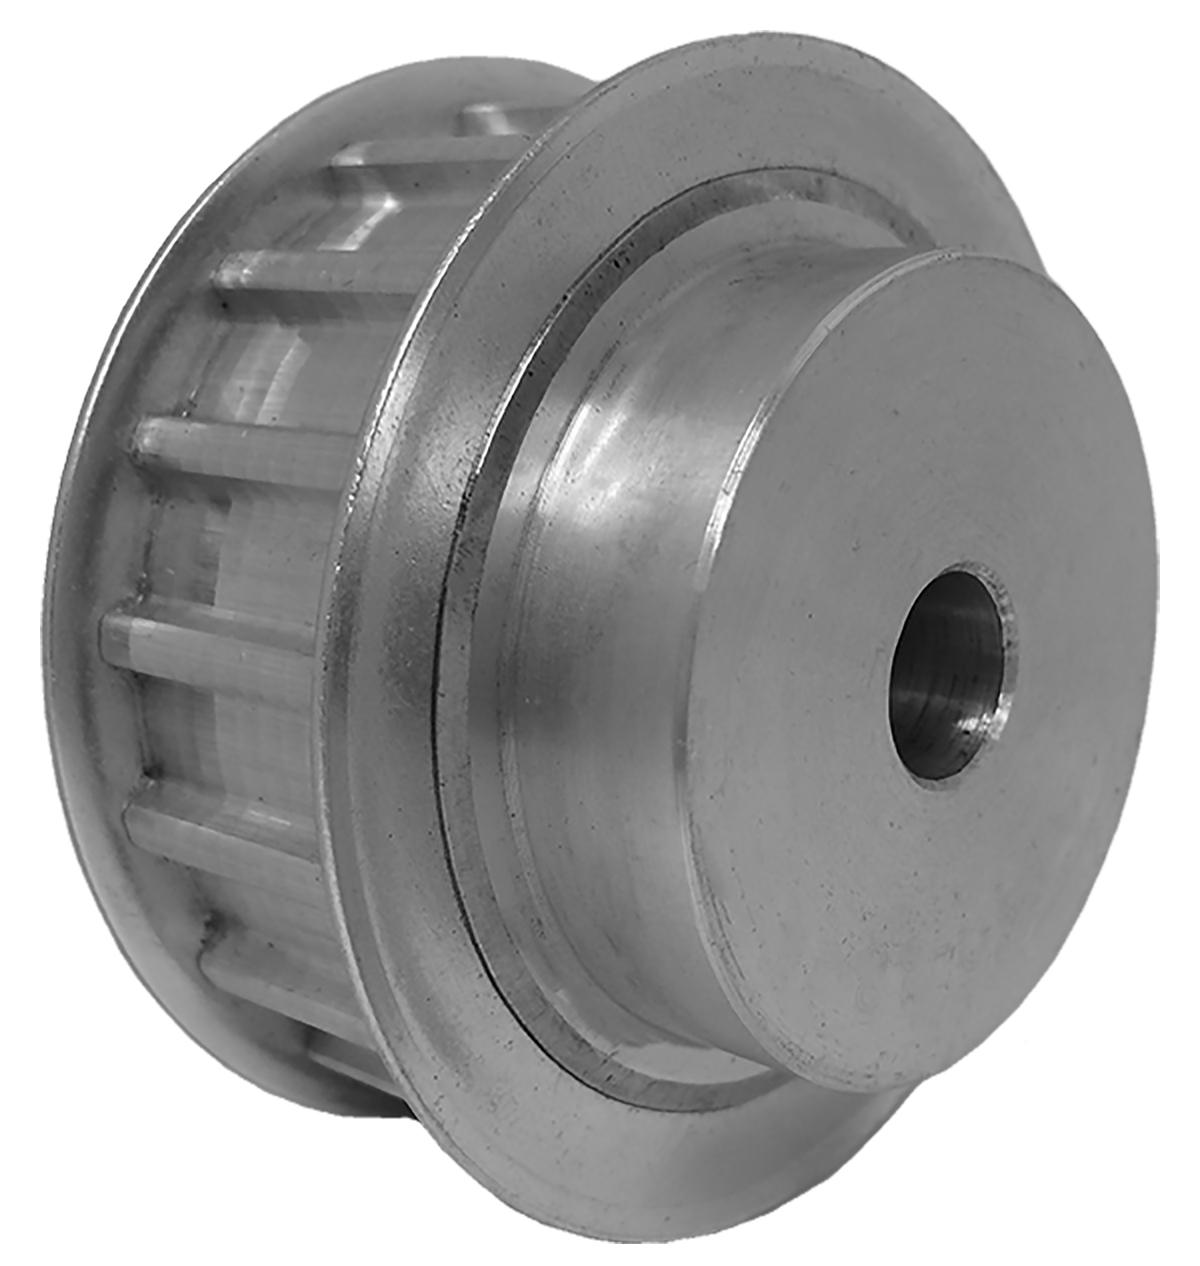 31AT10/18-2 - Aluminum Metric Pulleys